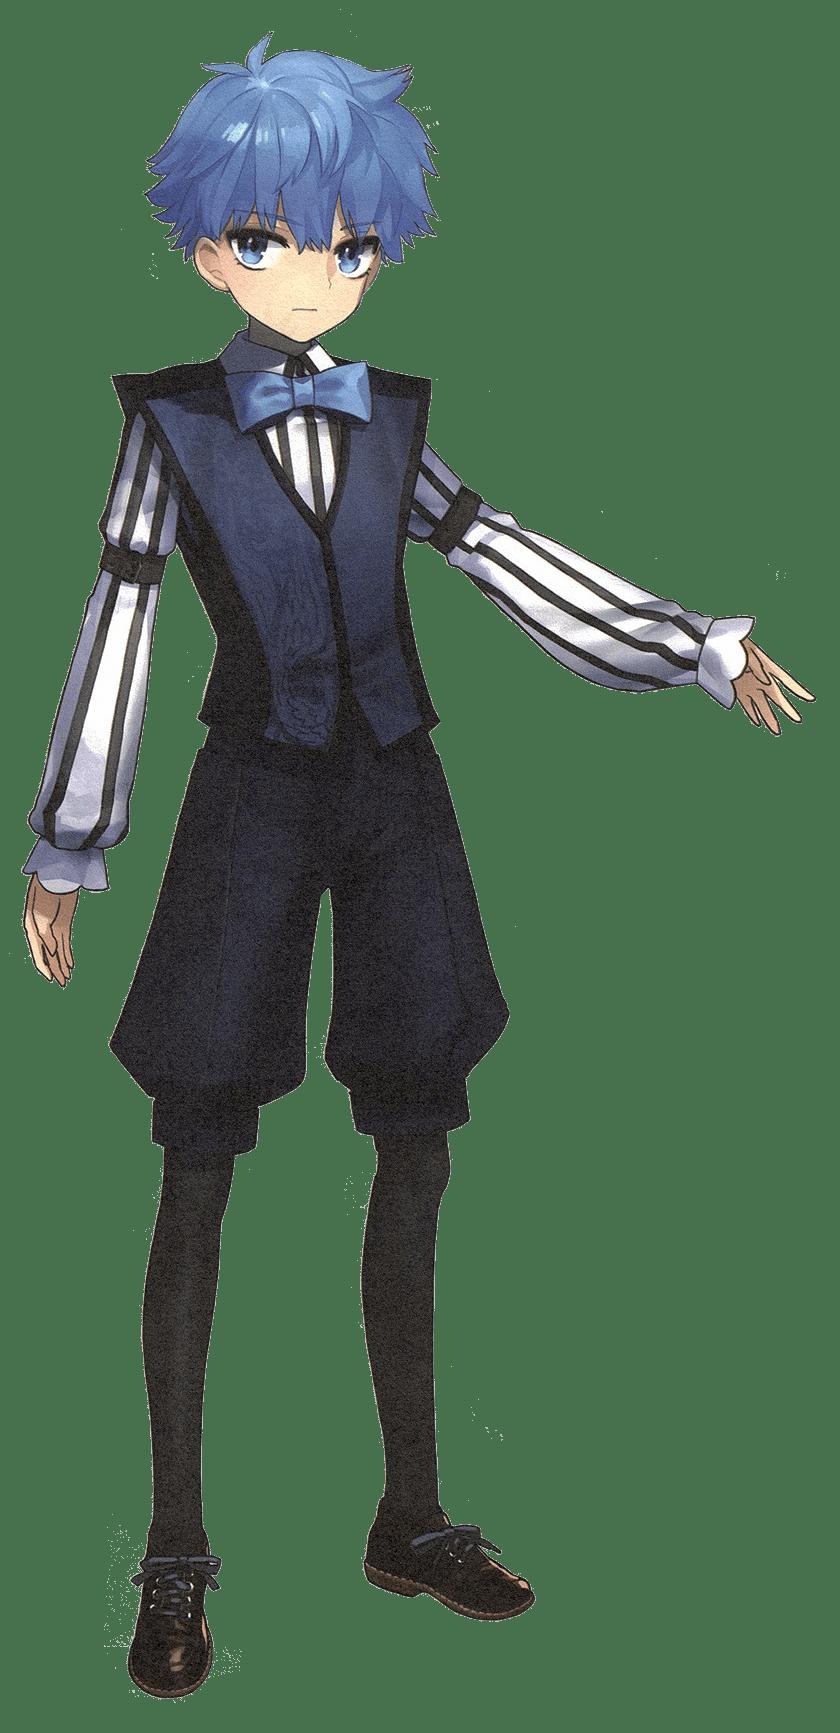 Cute Anime Girl Gun Wallpaper Caster Fate Extra Ccc Type Moon Wiki Fandom Powered